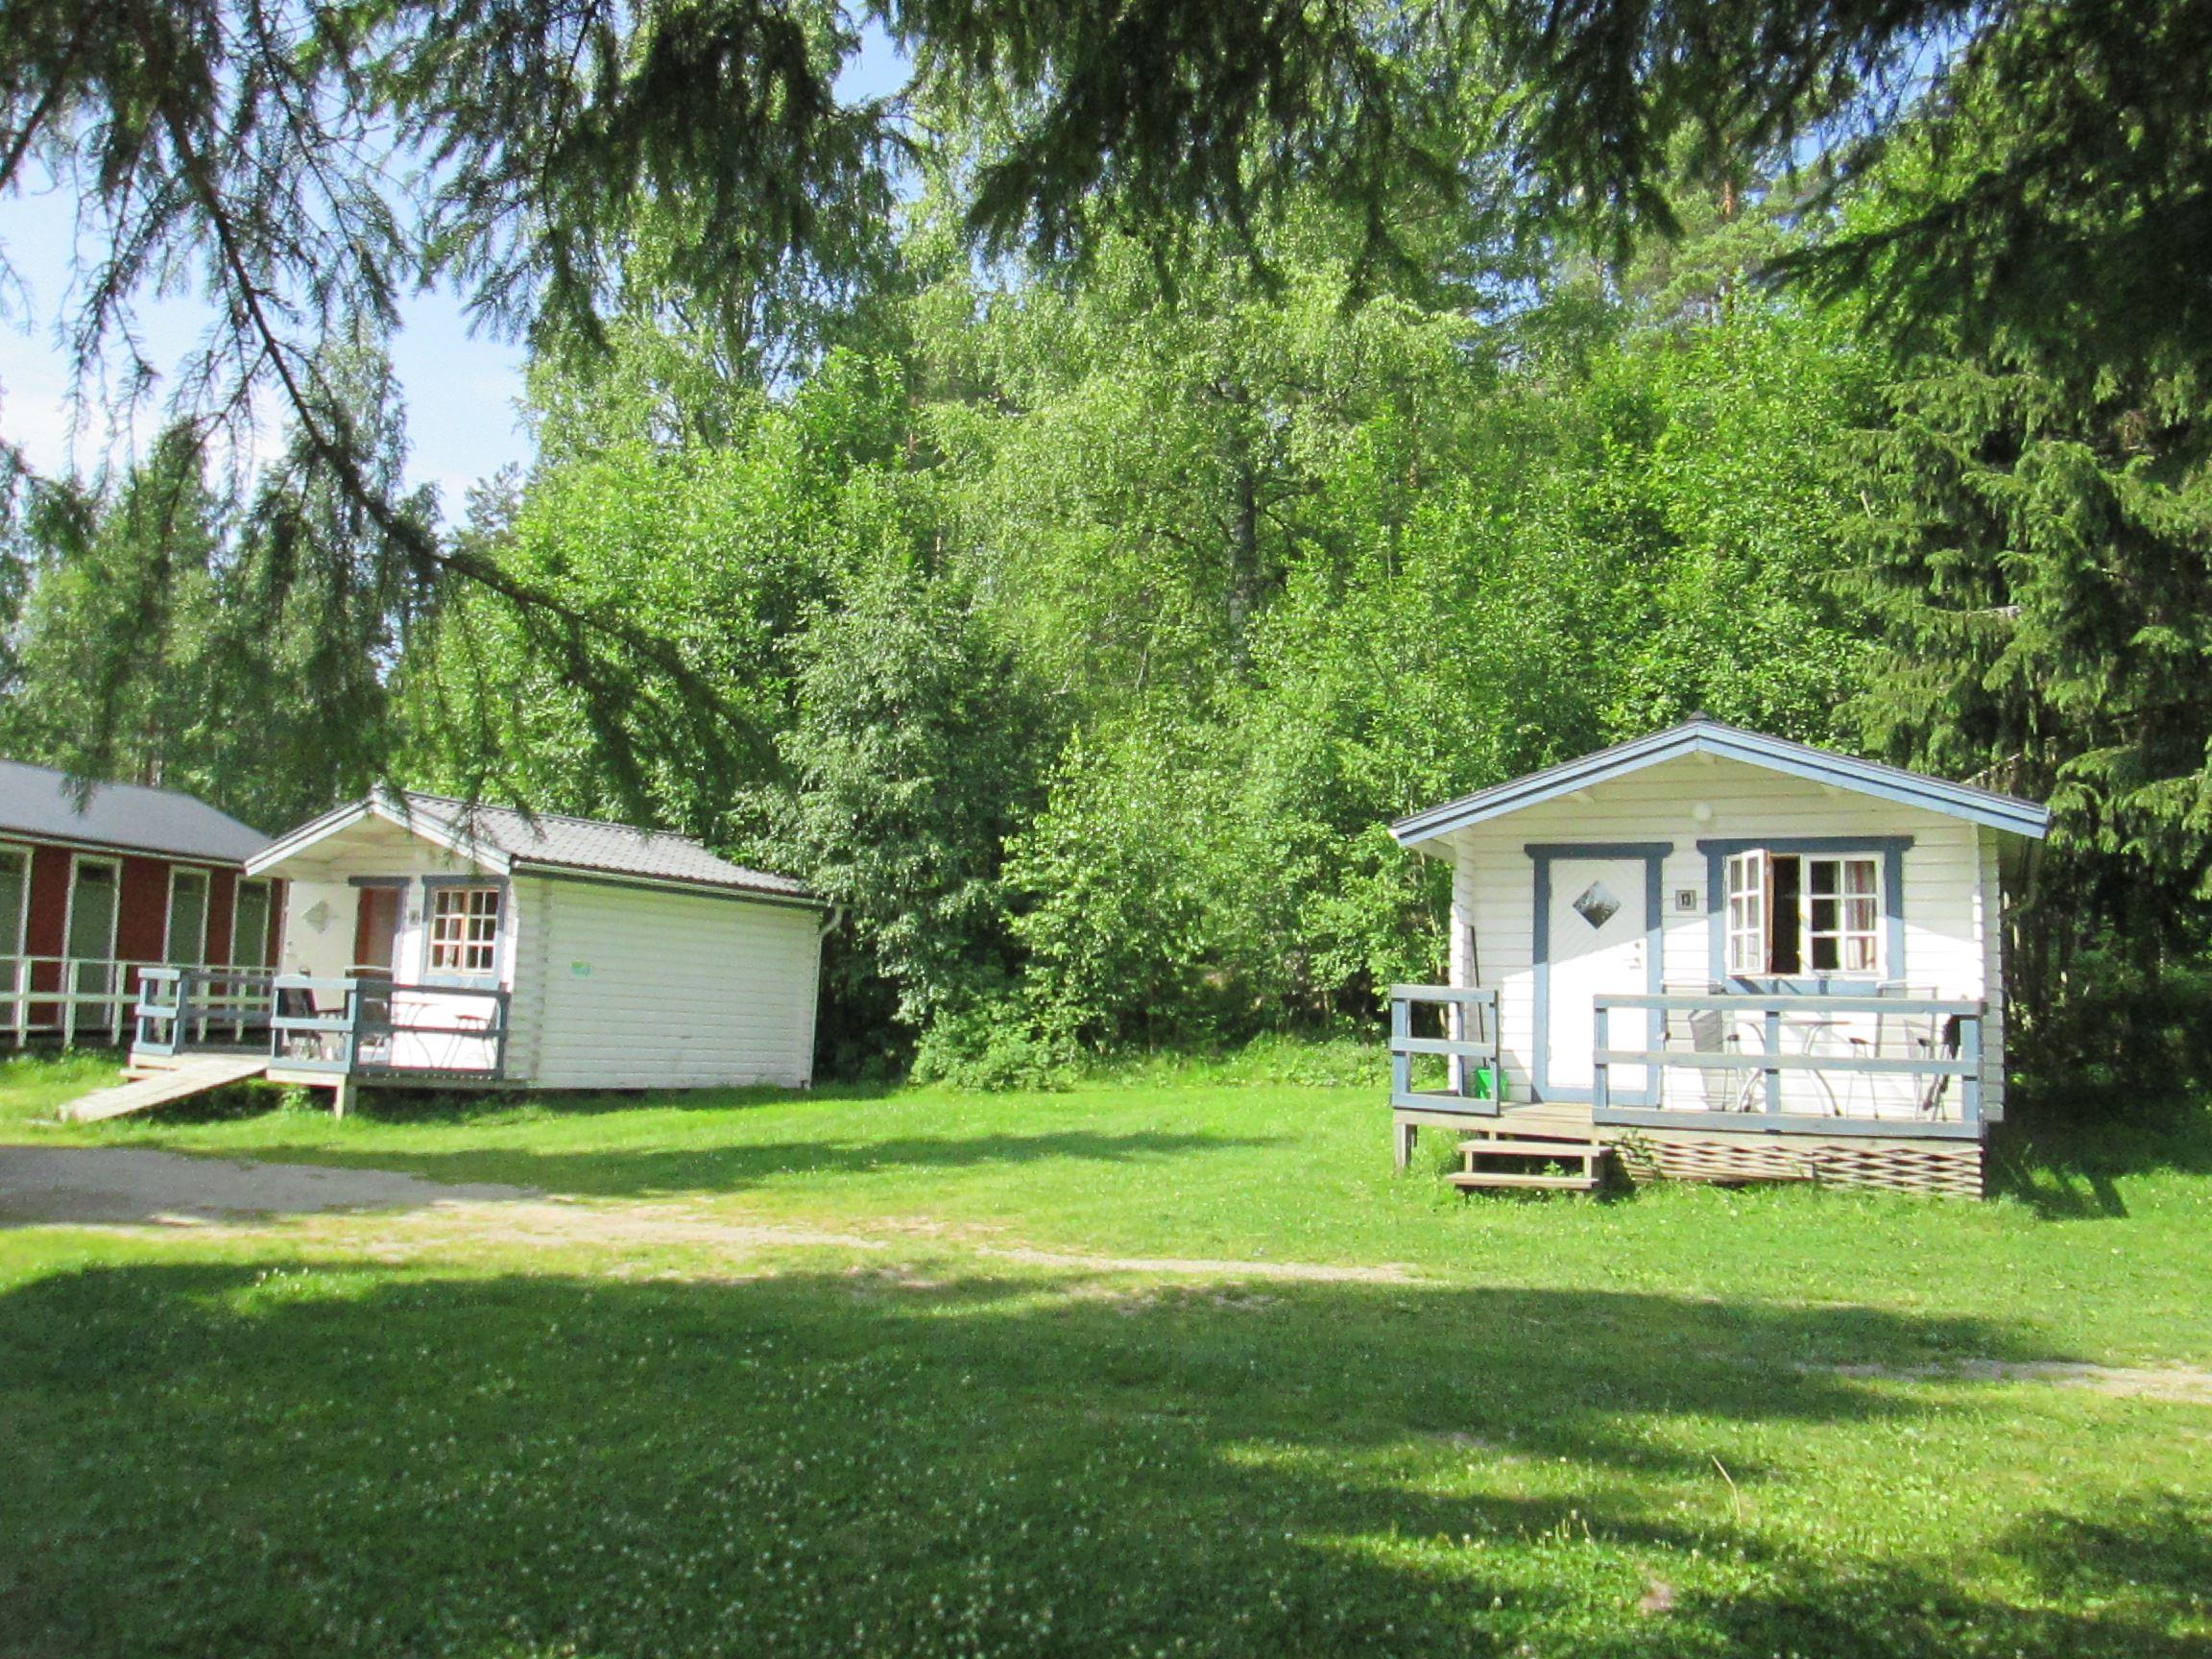 Stöde camping Cabins